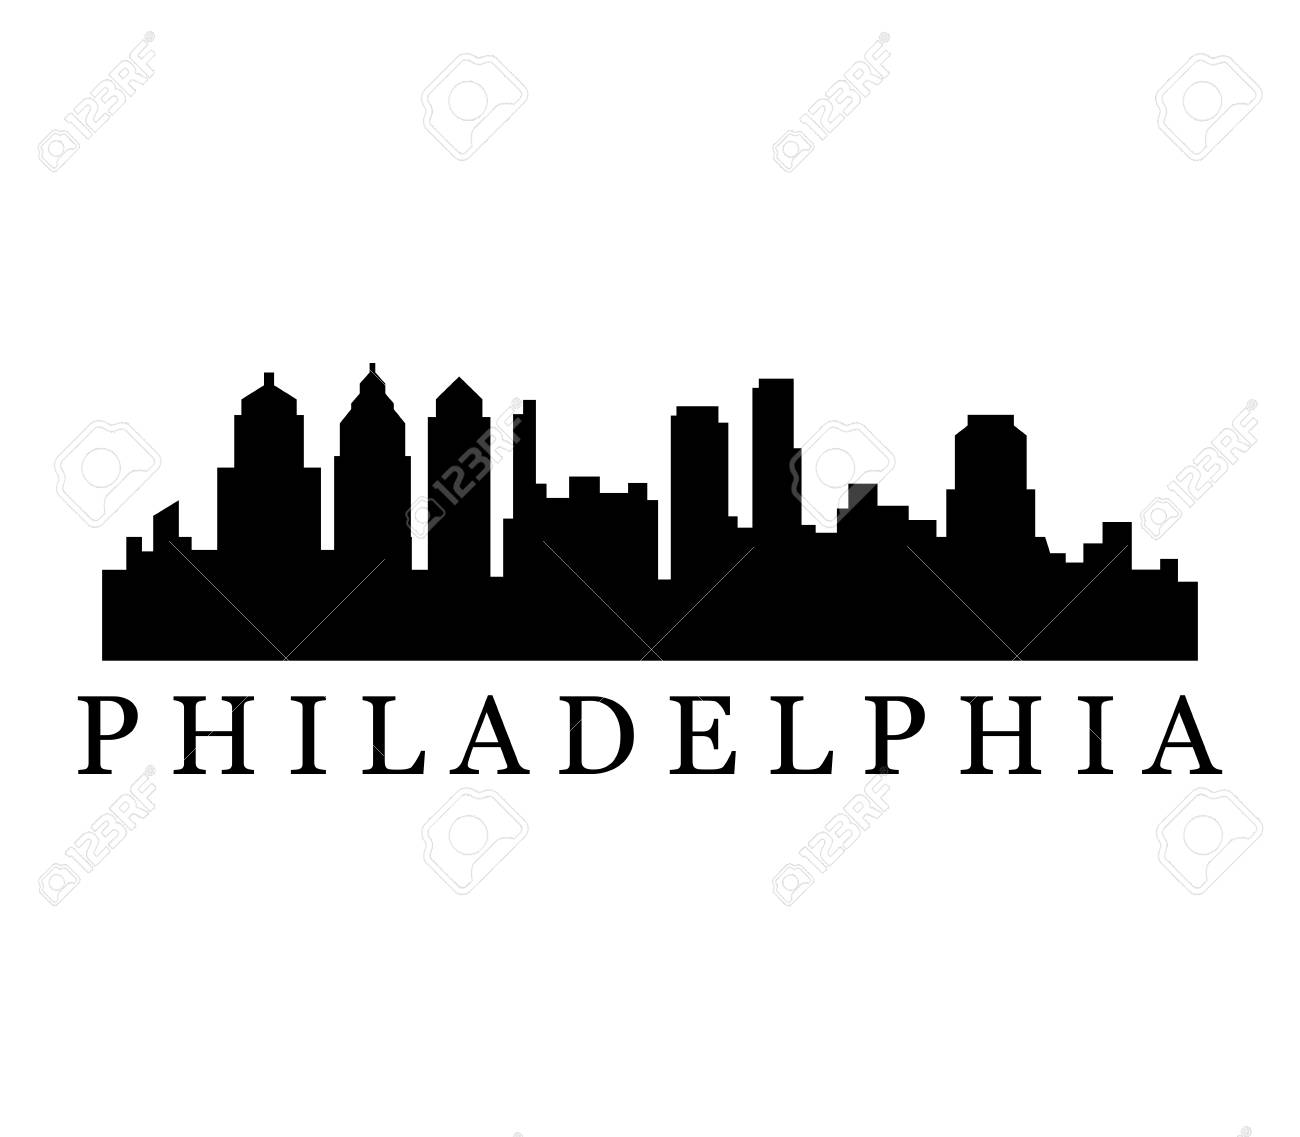 philadelphia skyline royalty free cliparts, vectors, and stock  illustration. image 97819909.  123rf